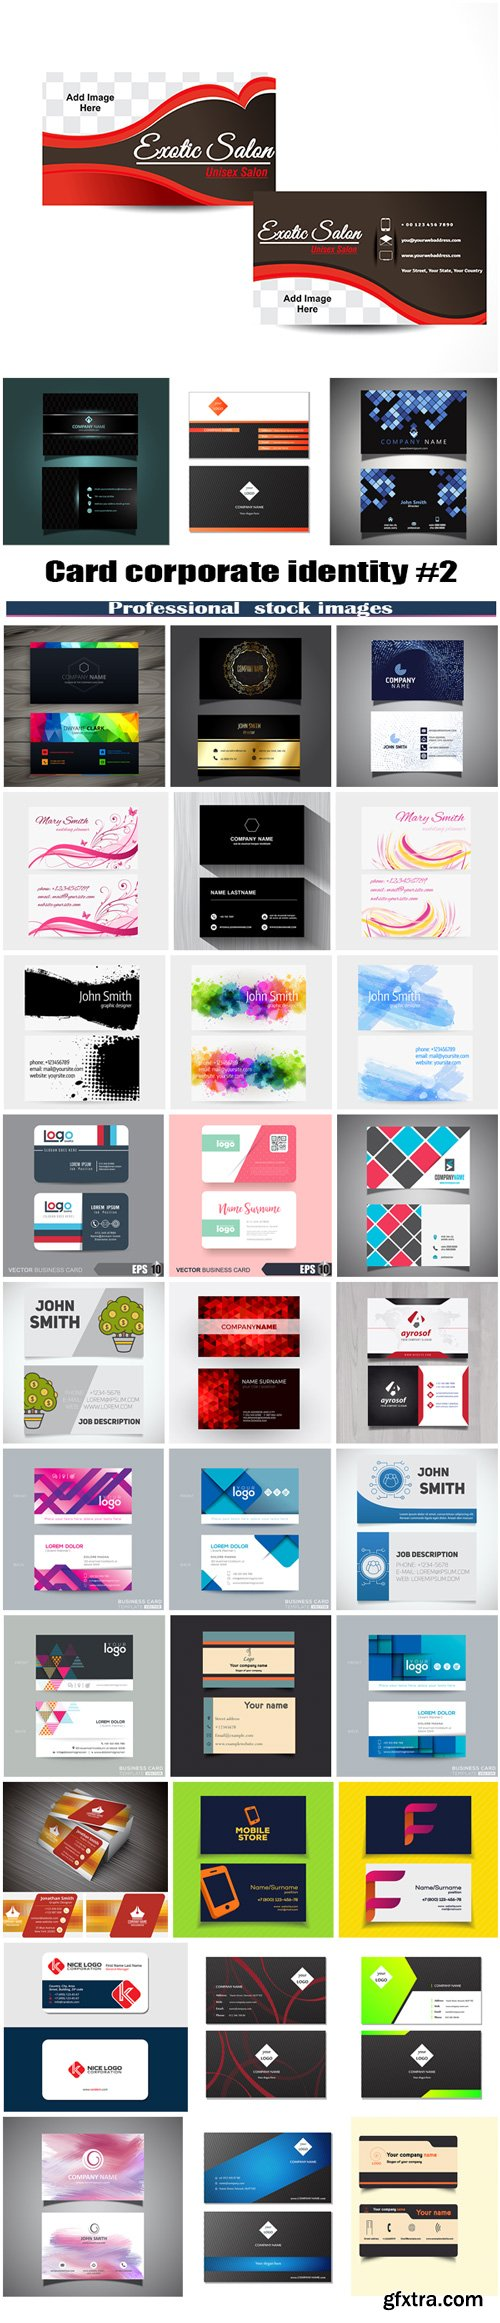 Card corporate identity #2